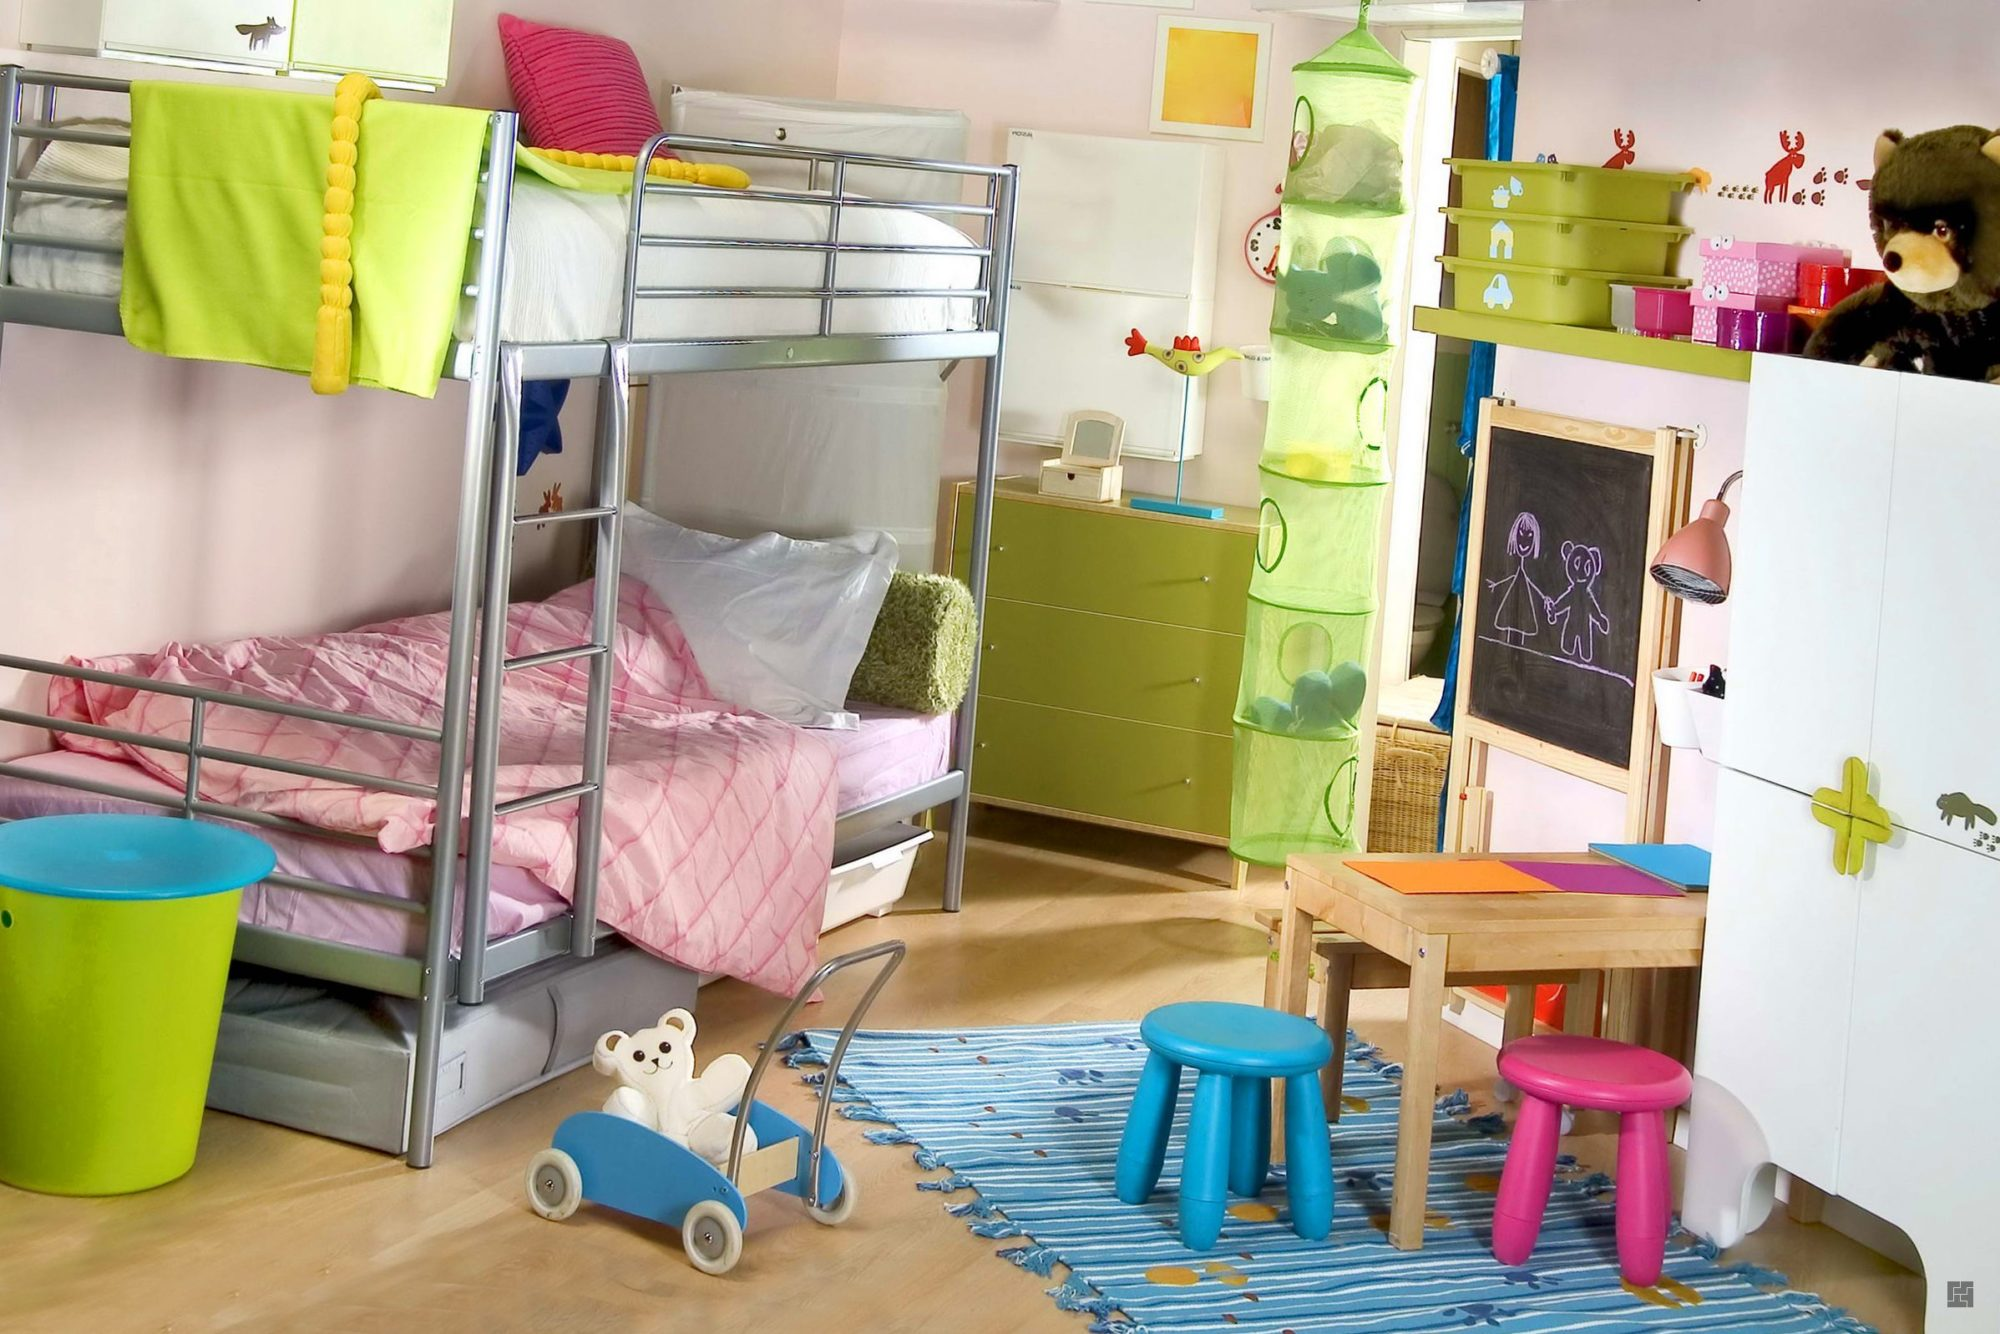 Дизайн детской комнаты для двух мальчиков (фото): http://remboo.ru/design/detskaya-komnata-dlya-dvuh-malchikov.html